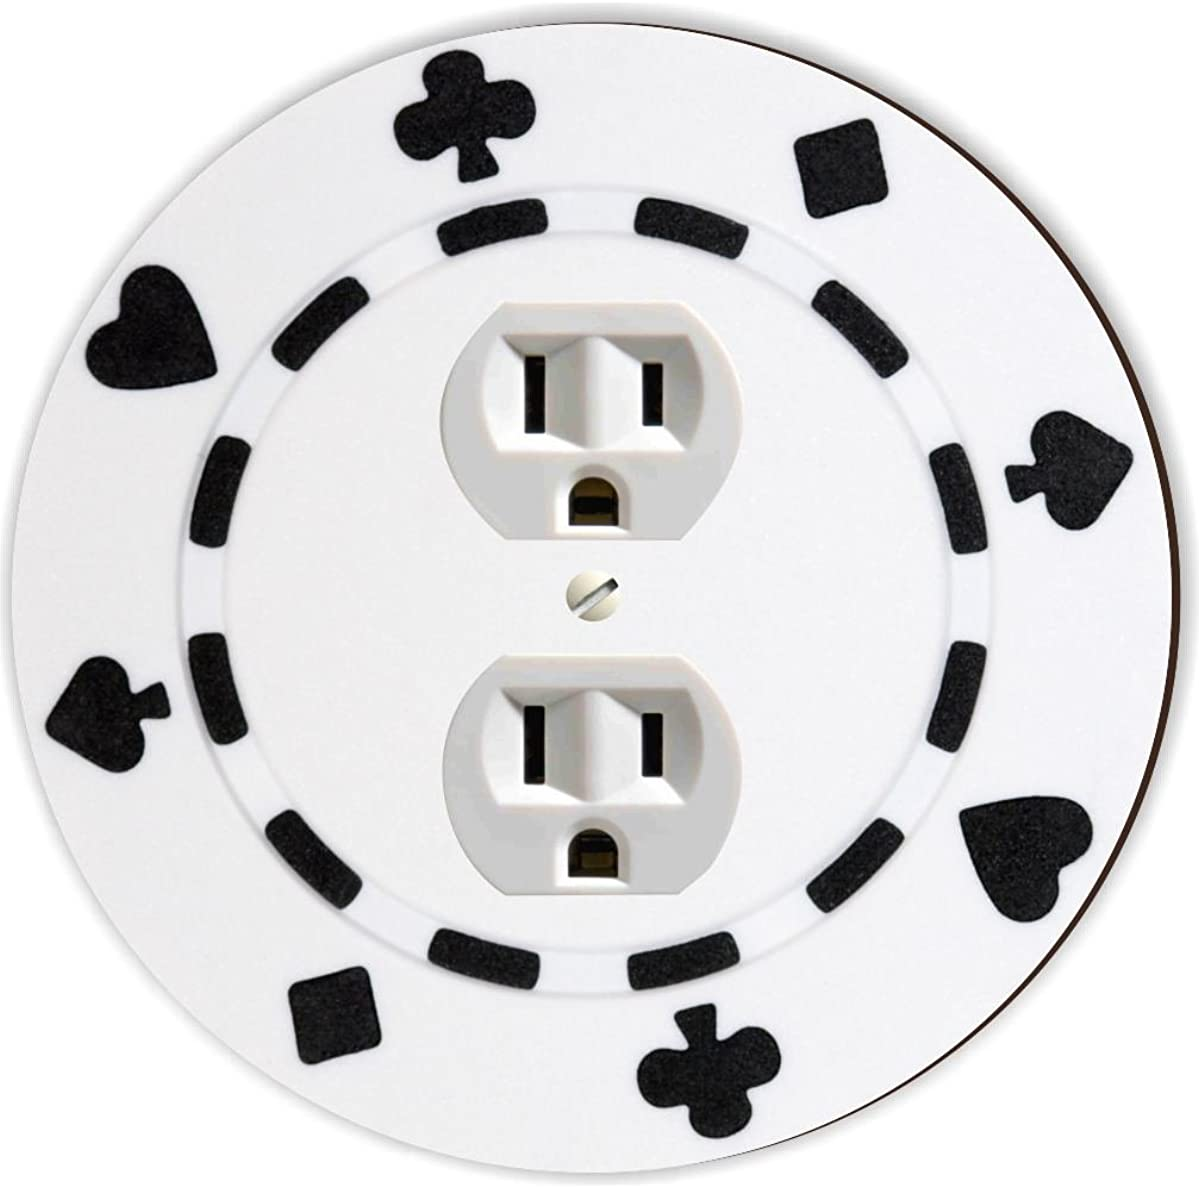 Rikki Knight RND-OUTLET-84 Poker Chip Round Single Outlet Plate, White/Black